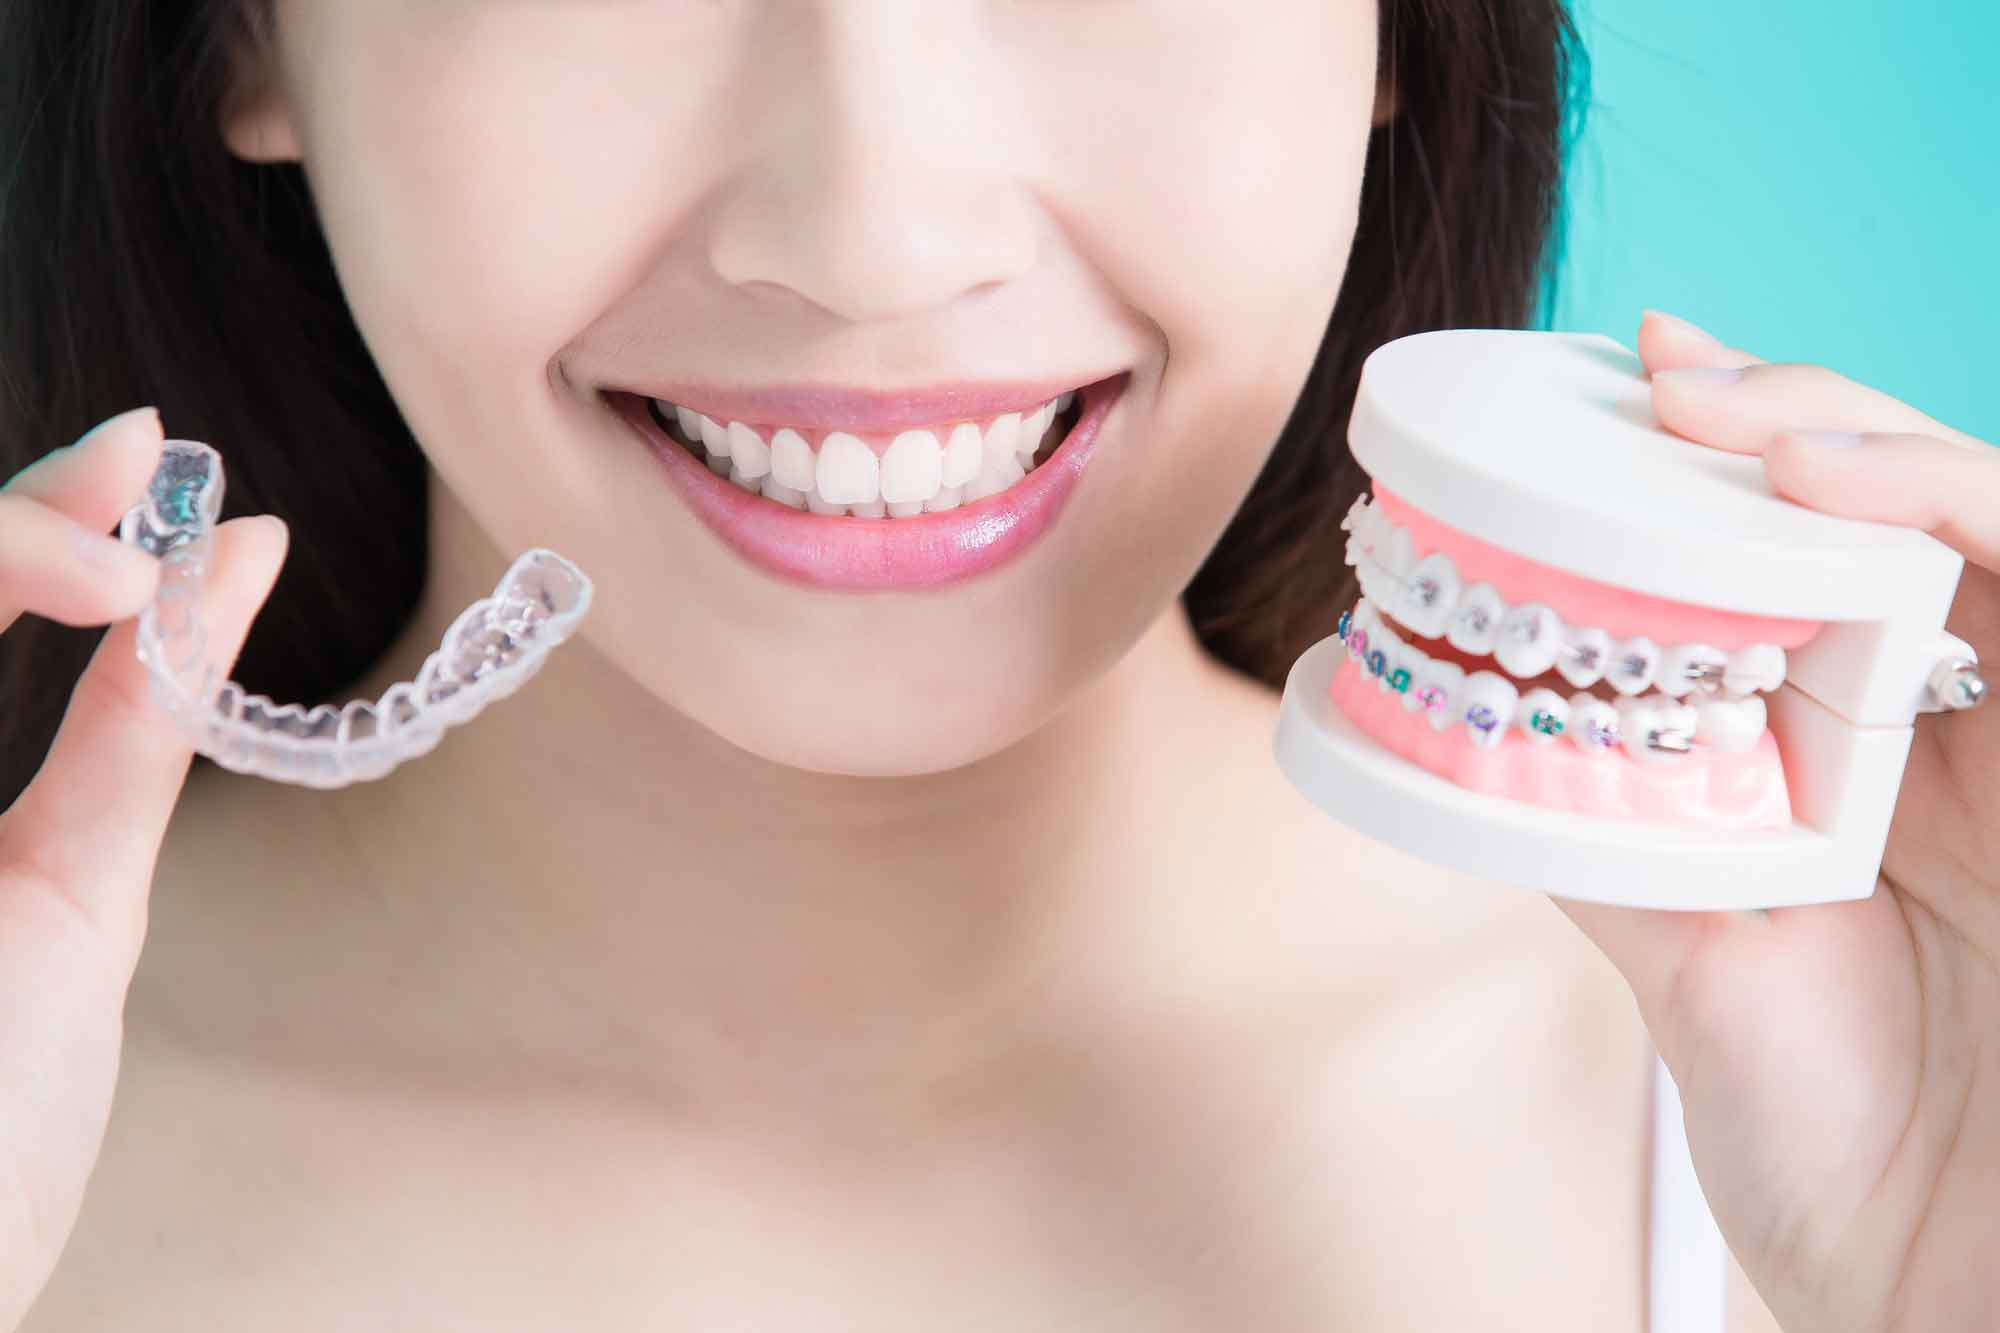 teen choosing Invisalign or braces treatment